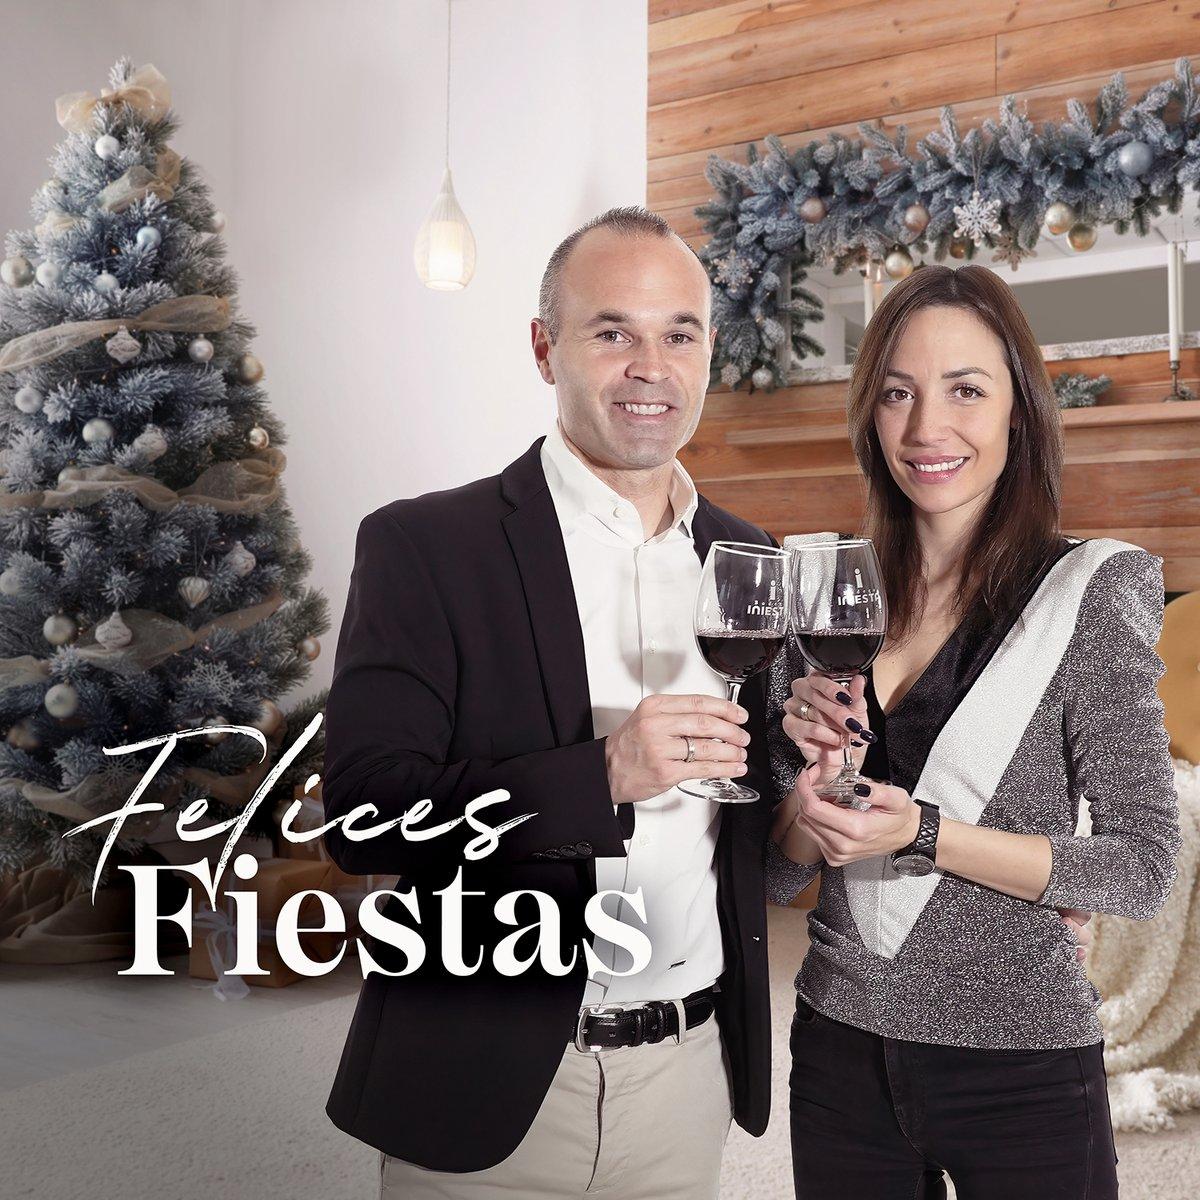 🎄Desde Bodega Iniesta os deseamos unas Felices Fiestas🎄🍷 · #FelizNavidad #FelicesFiestas #Navidad2020 #Nochebuena #BonNadal #Merrychristmas #JoyeuxNoël #FroheWeihnachten #vrolijkkerstfeest #WesołychŚwiąt #GodJul #BuonNatale #HyvääJoulua #メリークリスマス